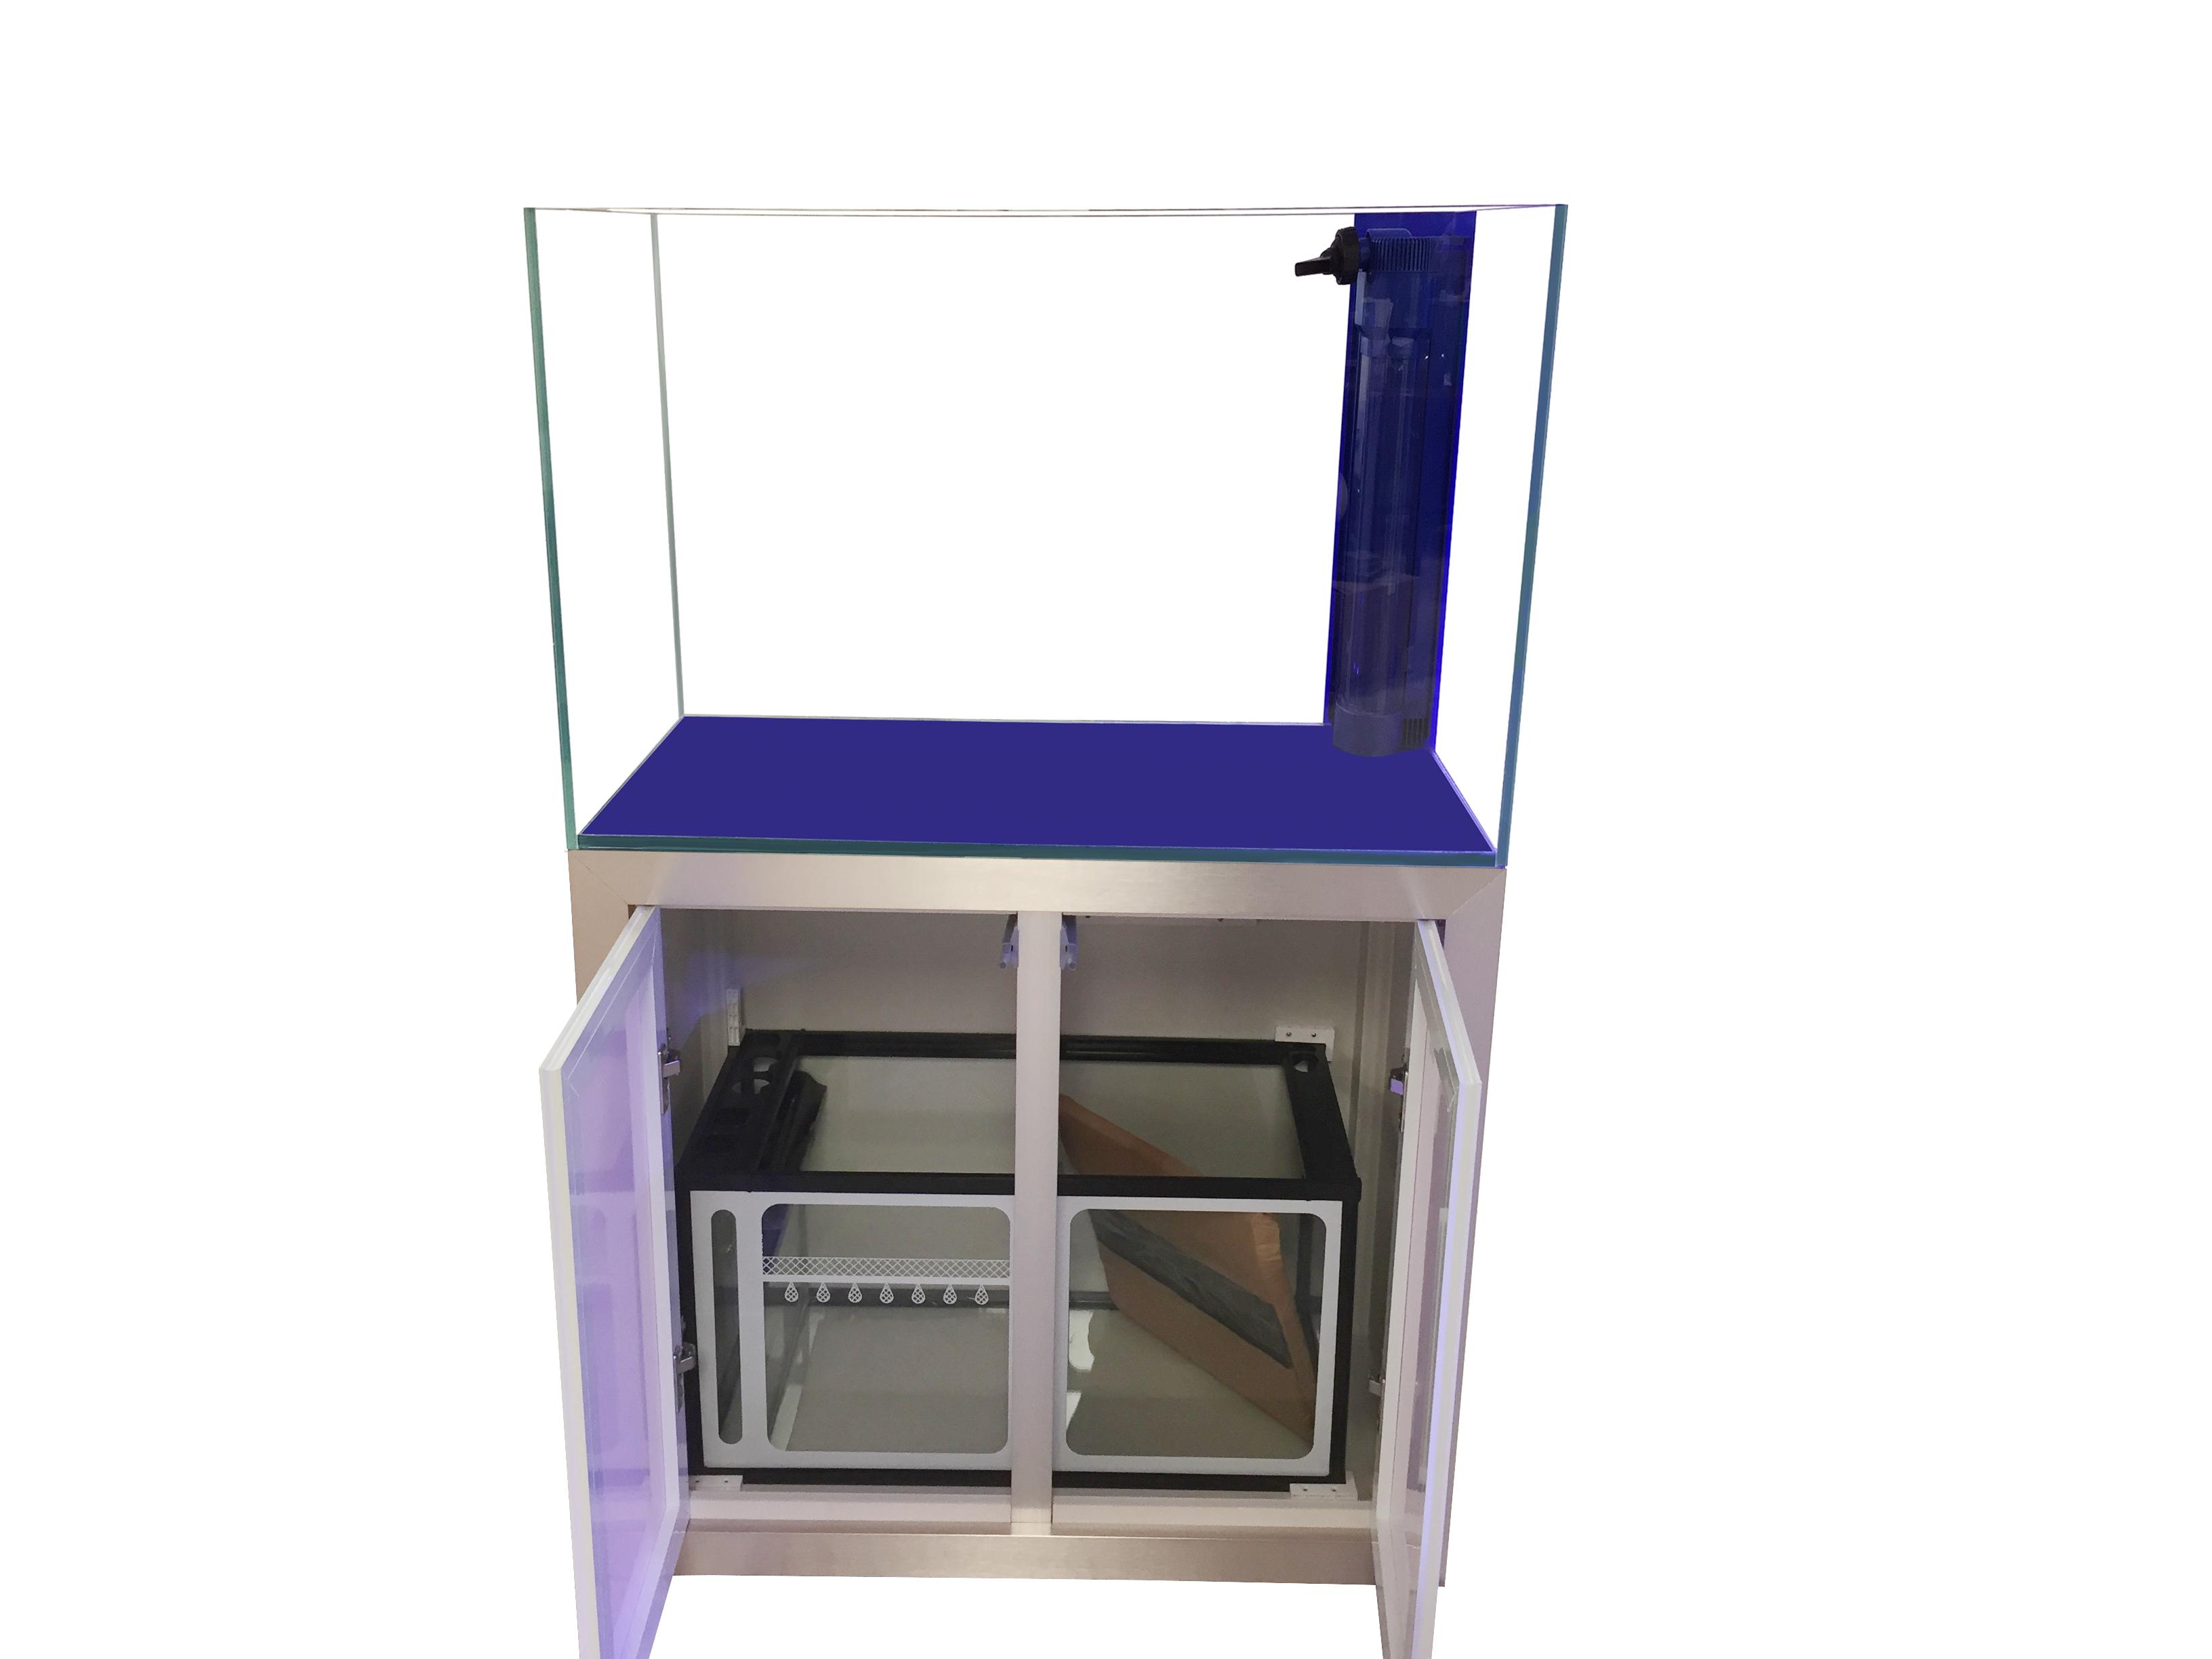 SunSun HCA-800D 44 Gallon Rimless Glass Tank Set w/ Overflow, Sump, & Cabinet Gallery